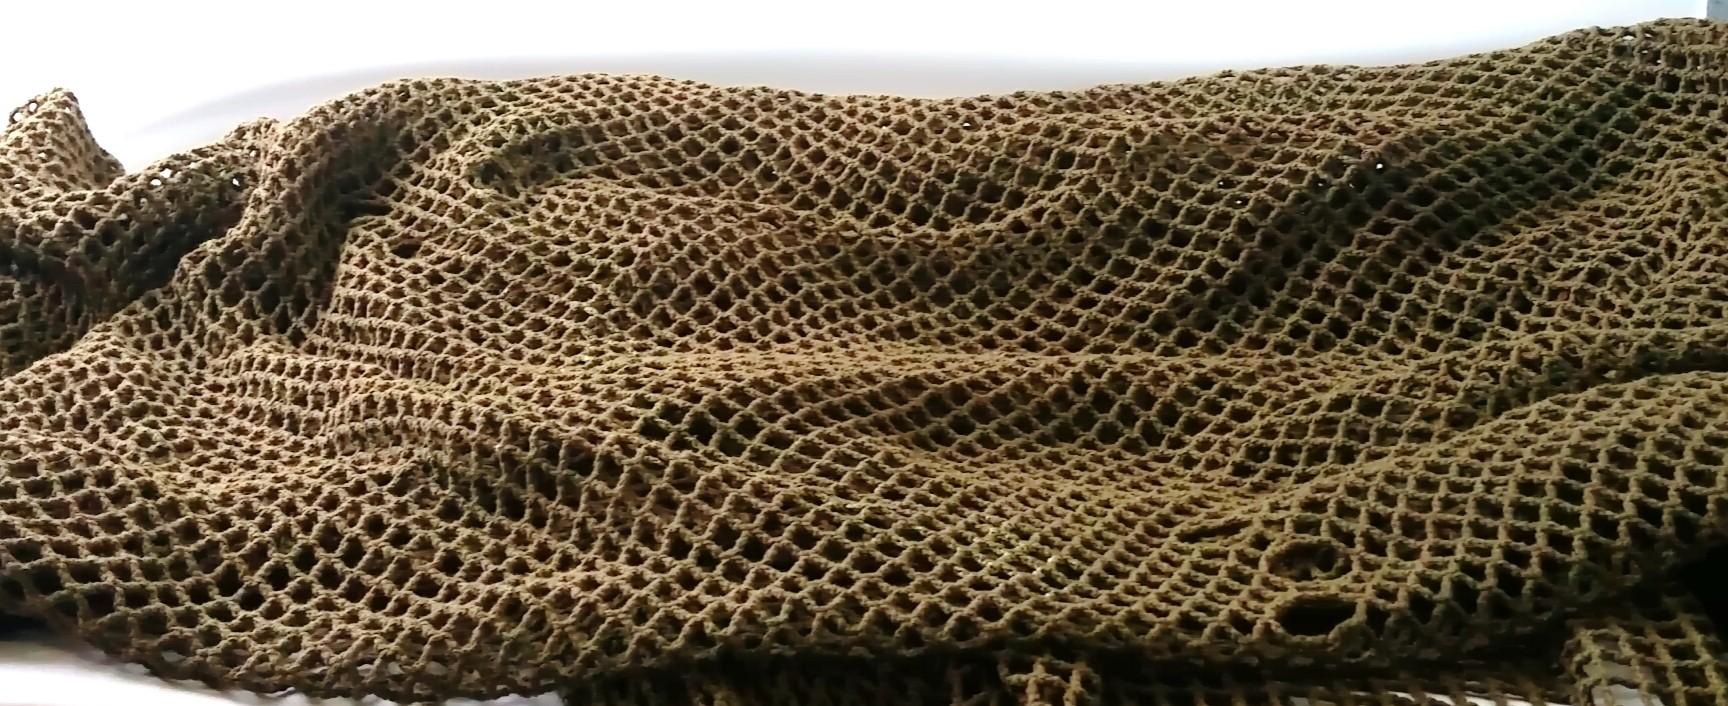 Swiss camouflage netting 20 X 20